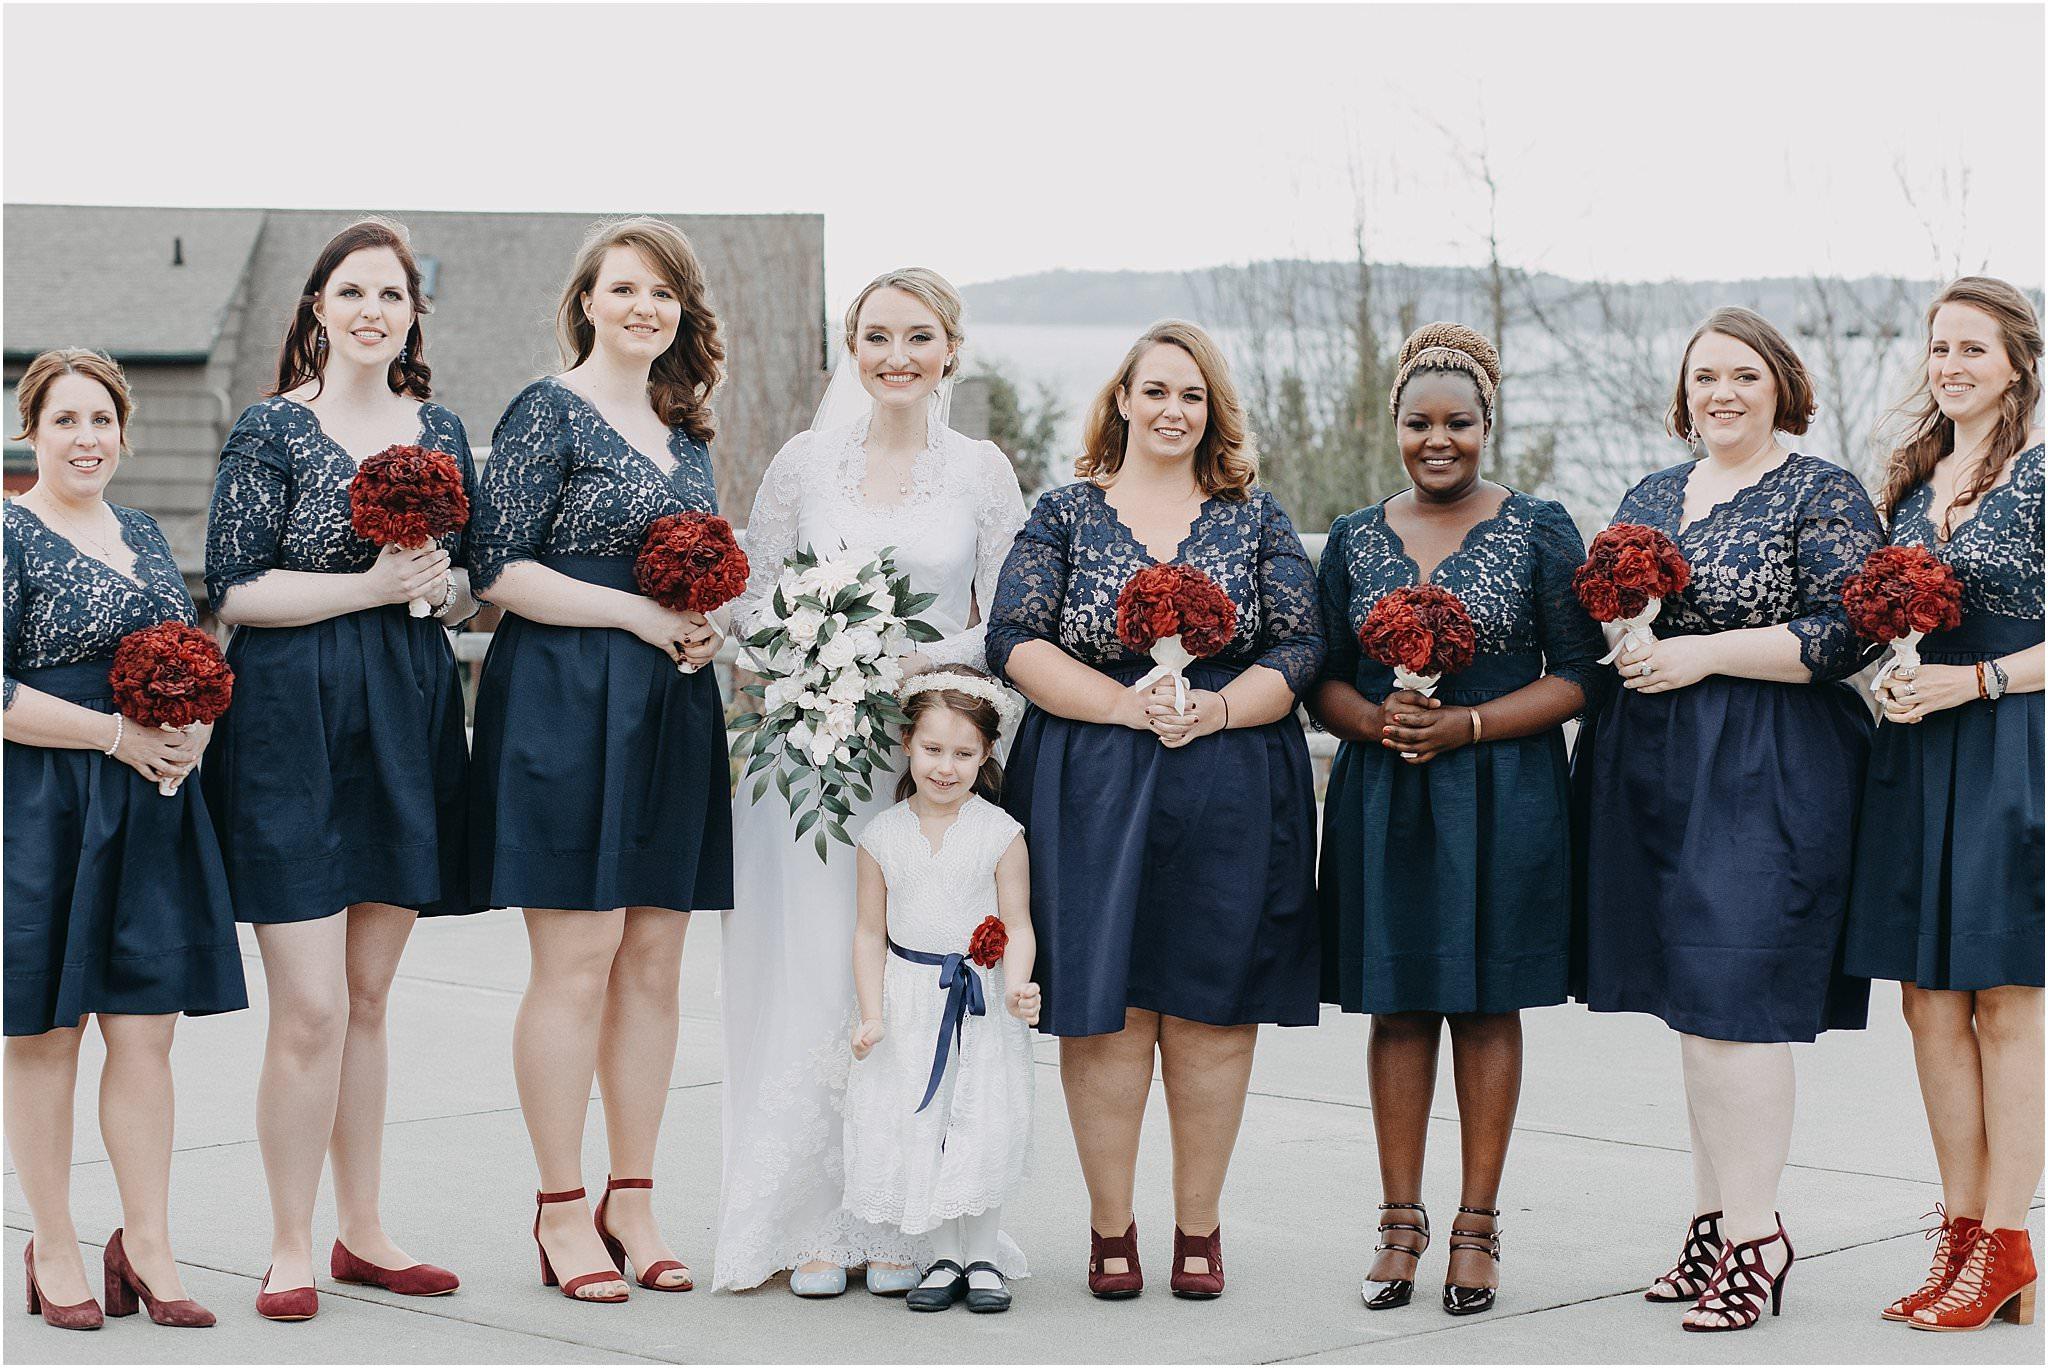 katy-robin-married-in-mukilteo-wedding25.jpg